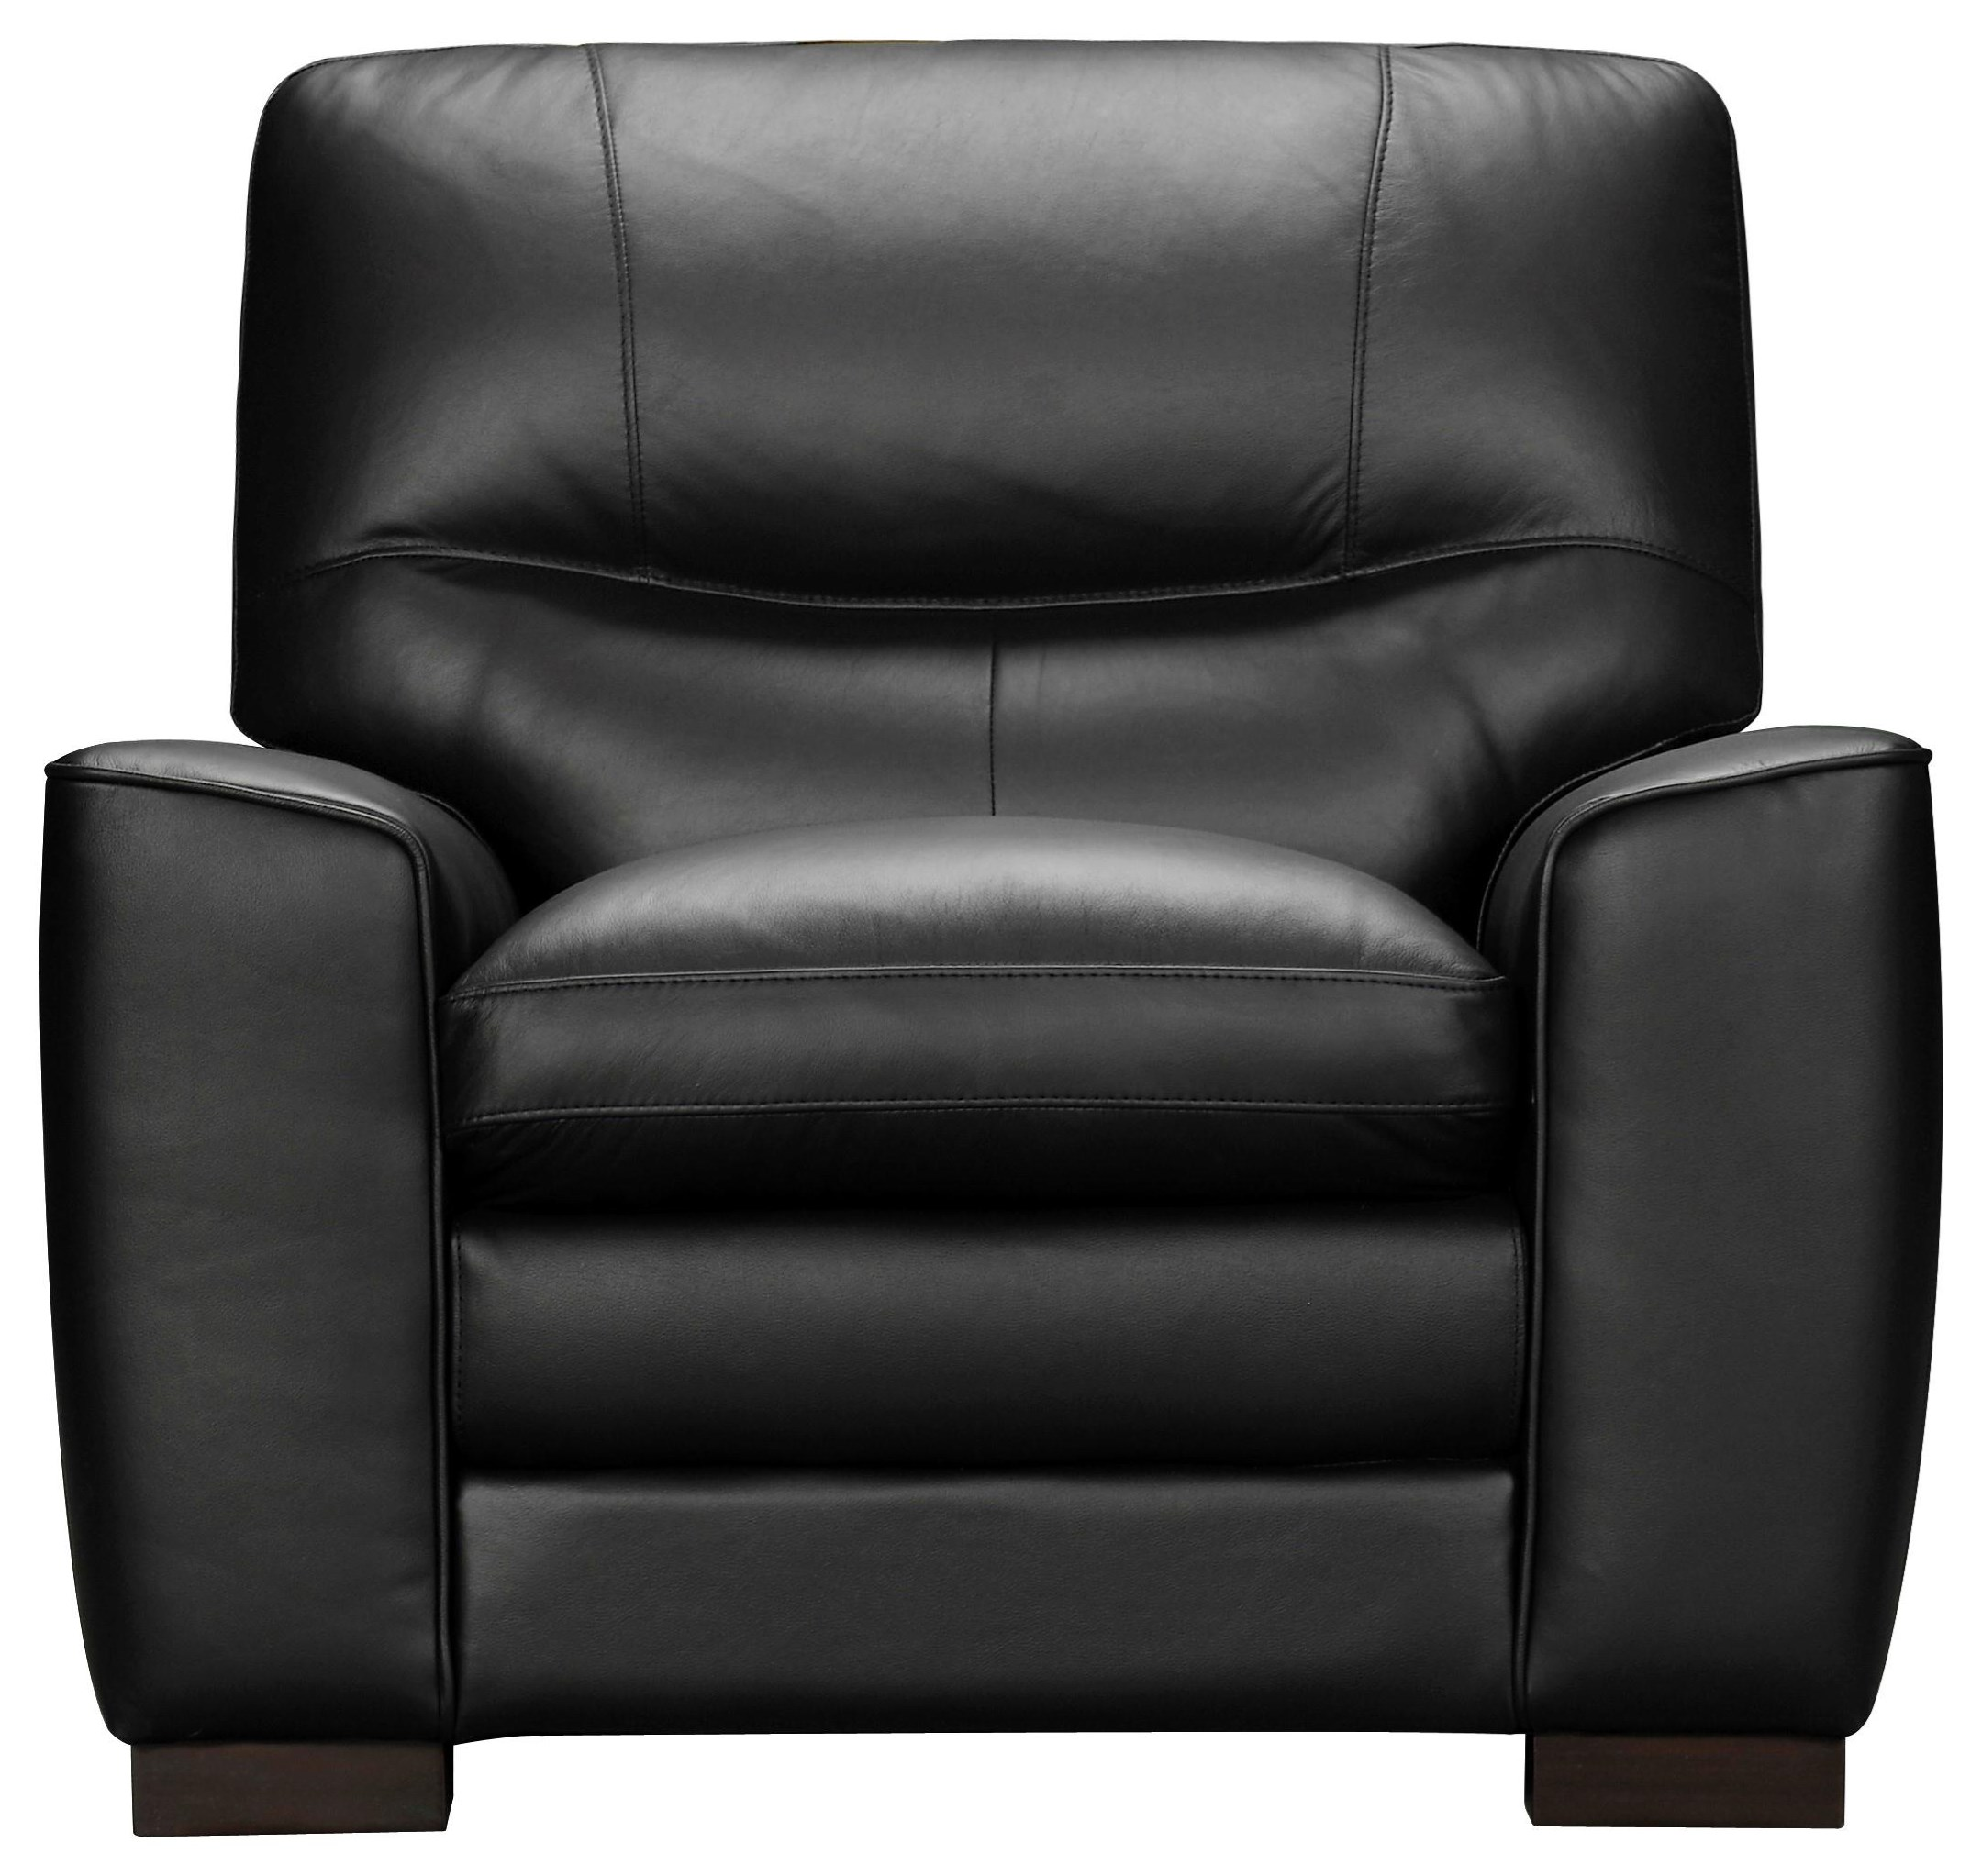 LANE Chair by Violino at HomeWorld Furniture